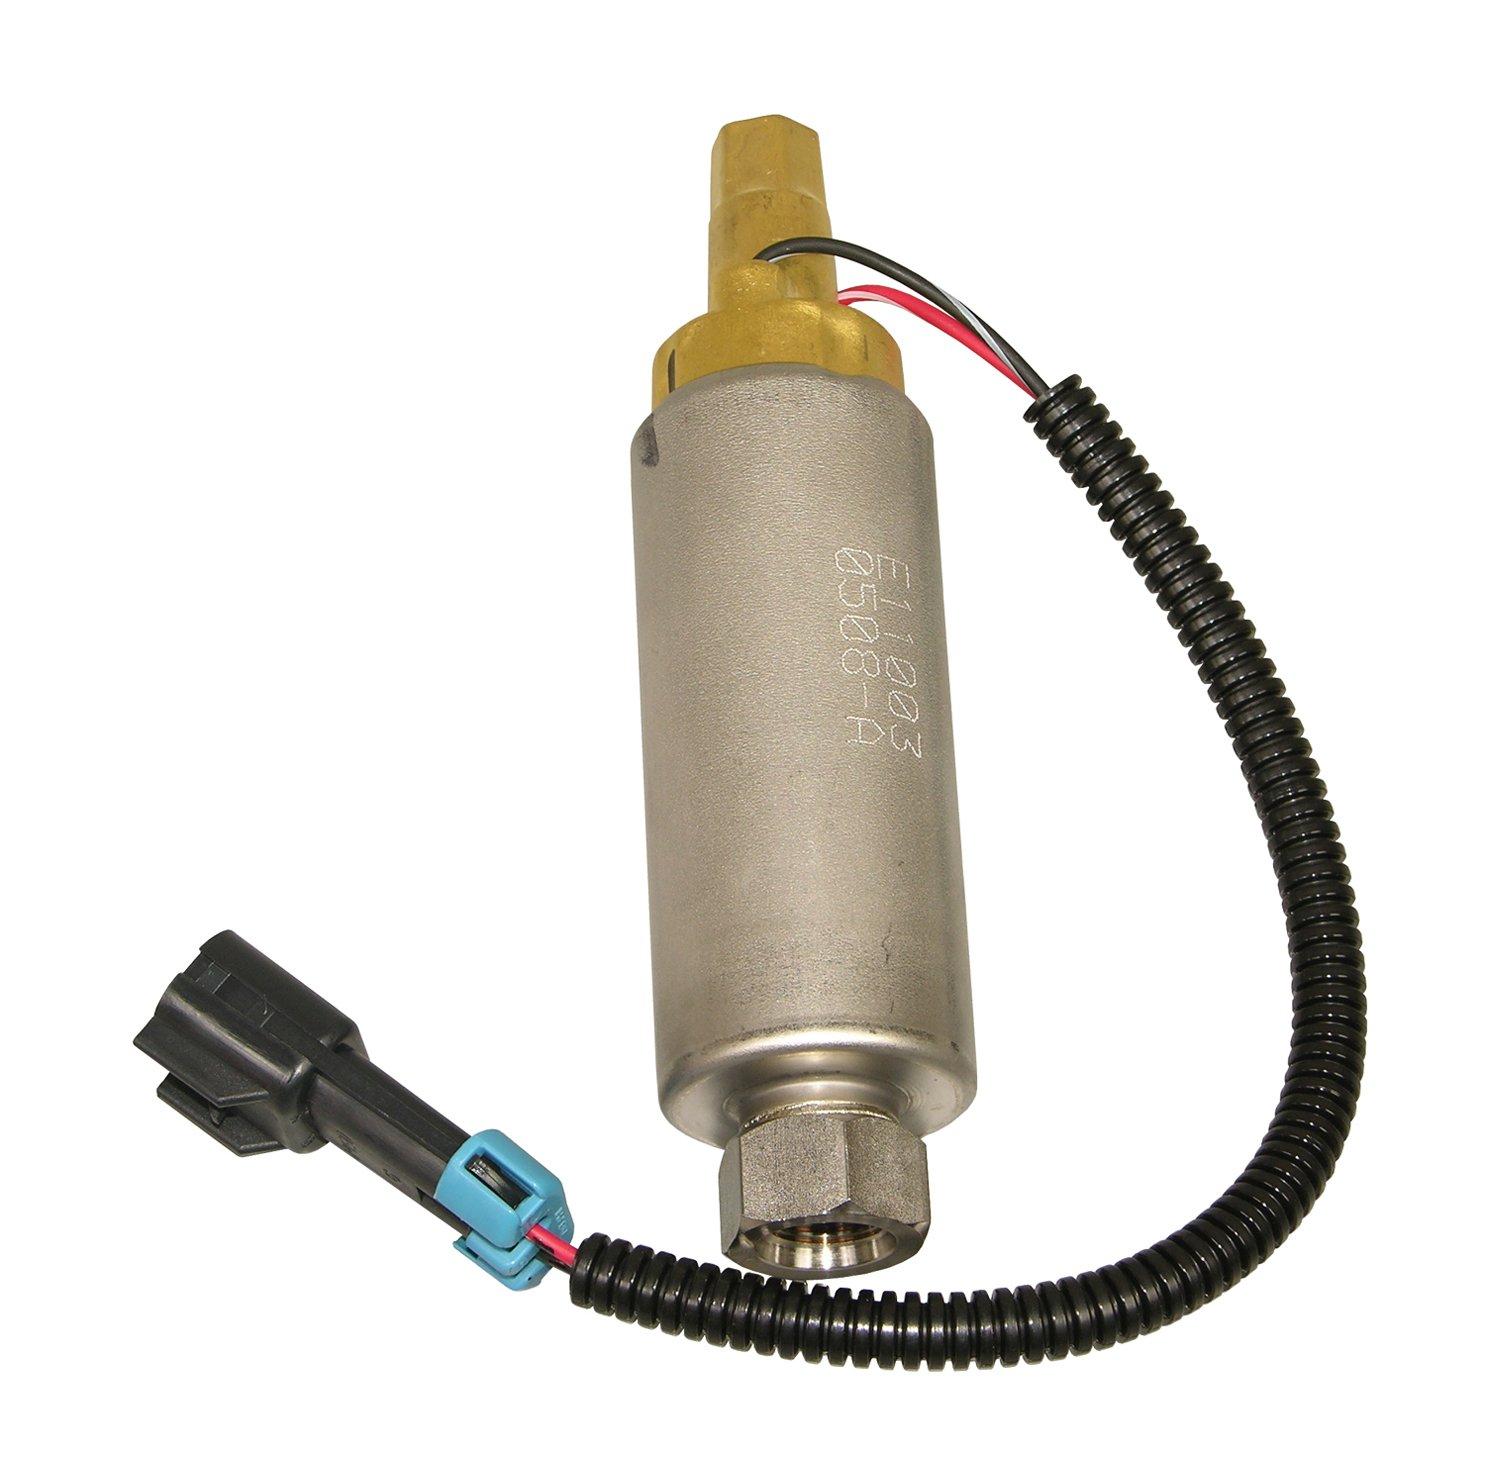 Mercruiser Electric Fuel Pump Not Lossing Wiring Diagram Amazon Com Airtex E11003 For Mercury Marine Rh